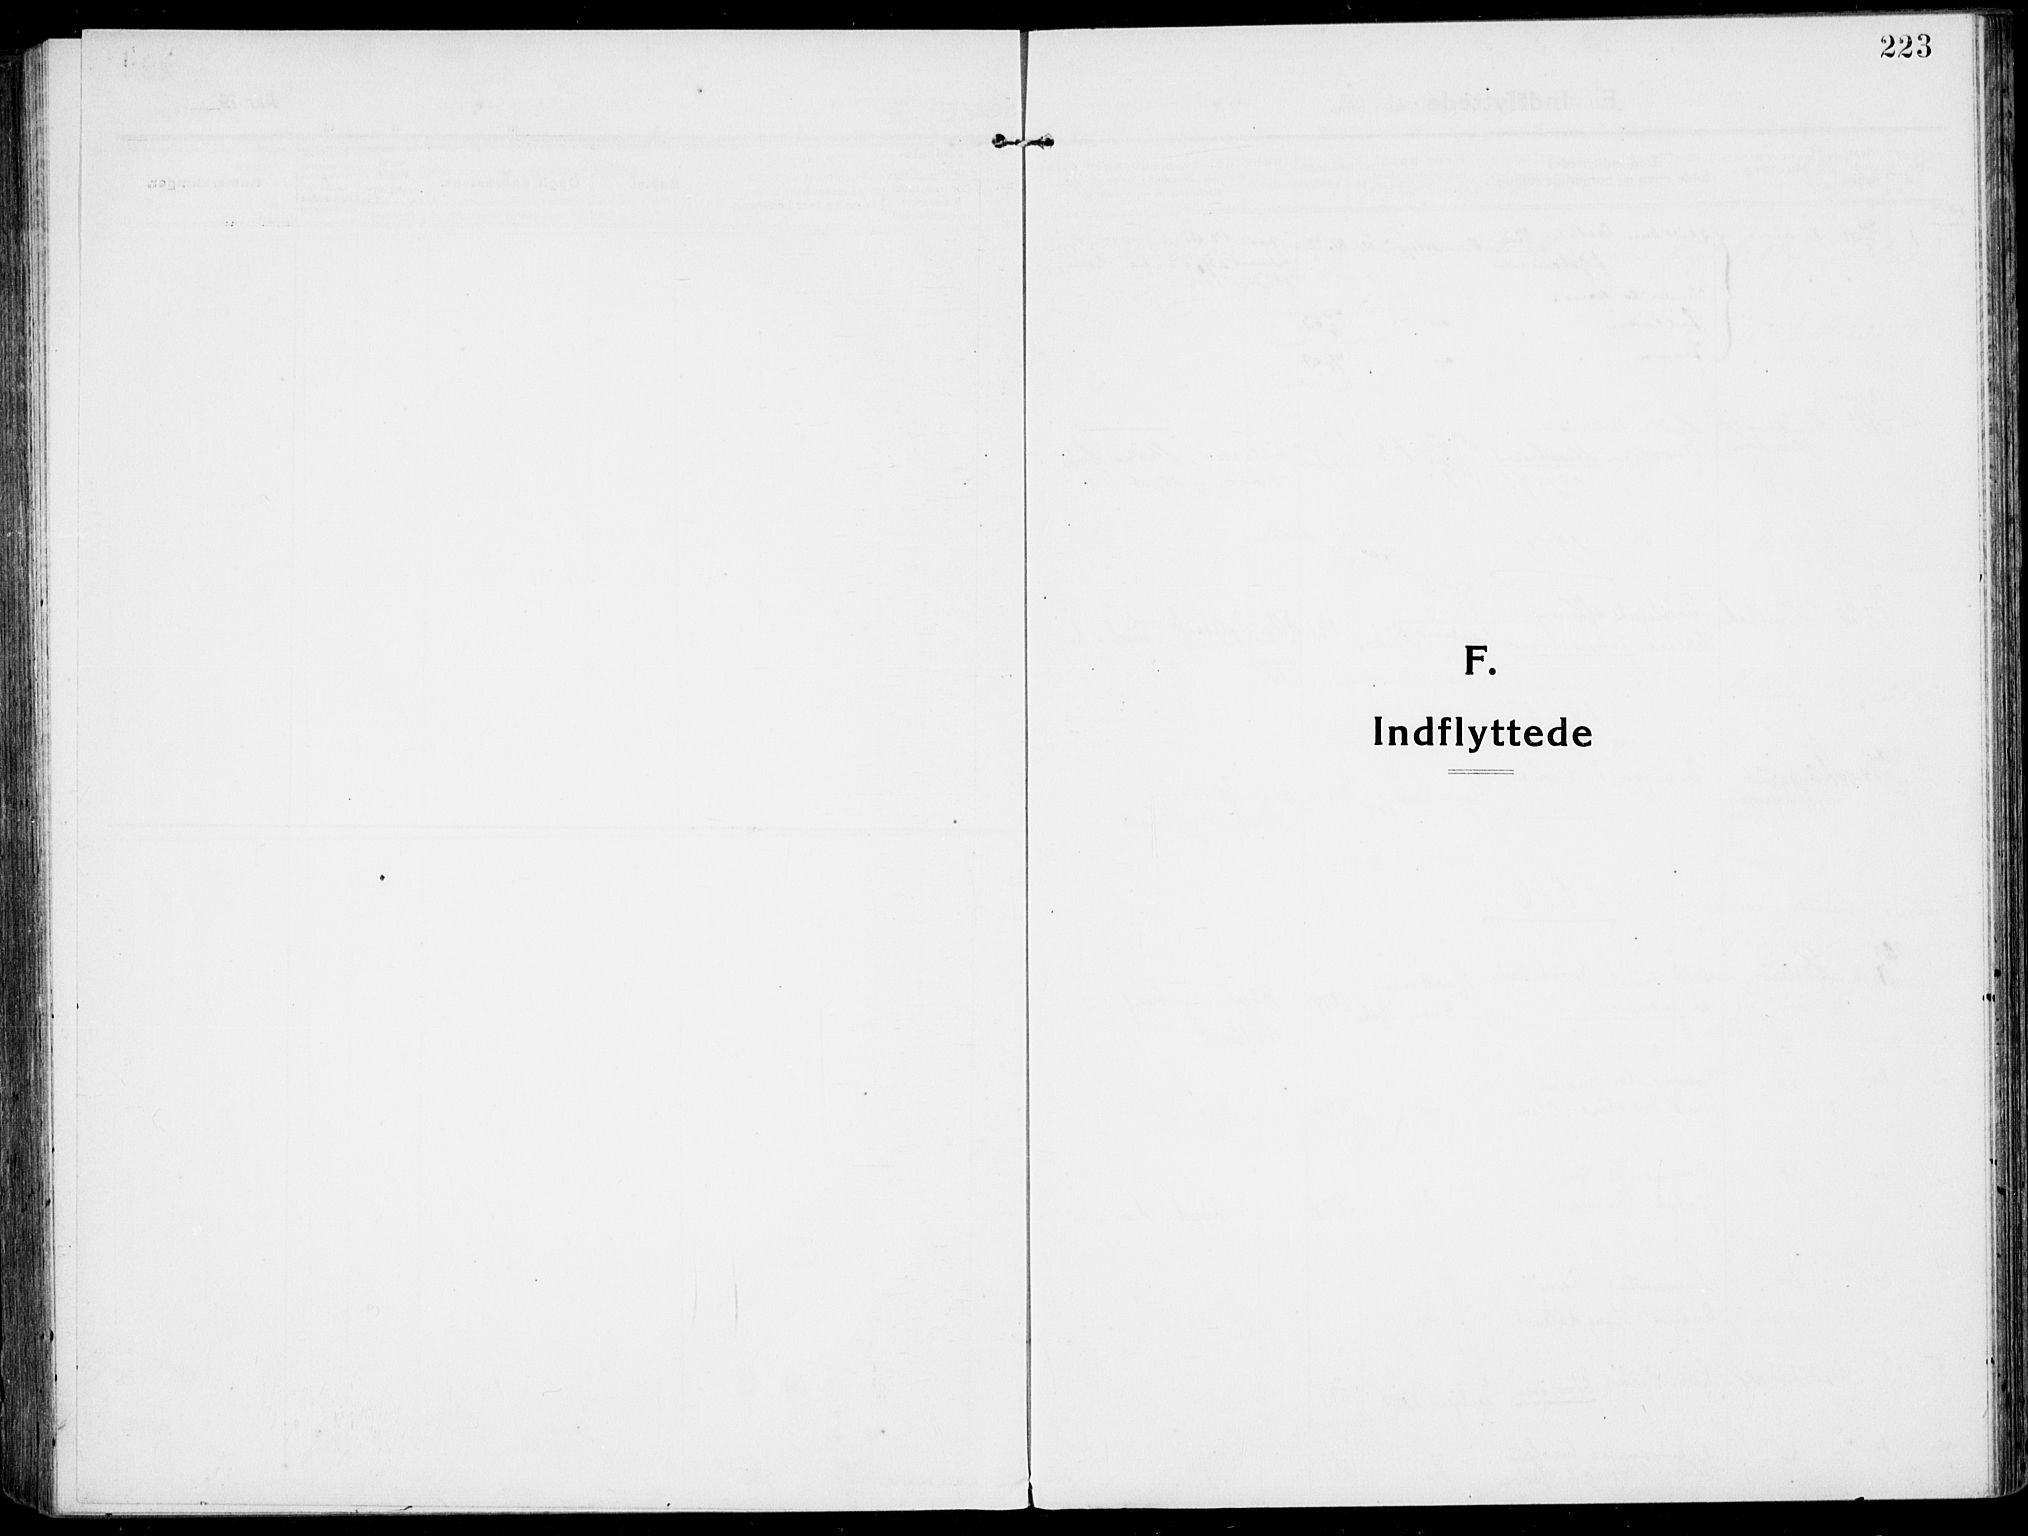 SAKO, Rjukan kirkebøker, F/Fa/L0002: Ministerialbok nr. 2, 1912-1917, s. 223